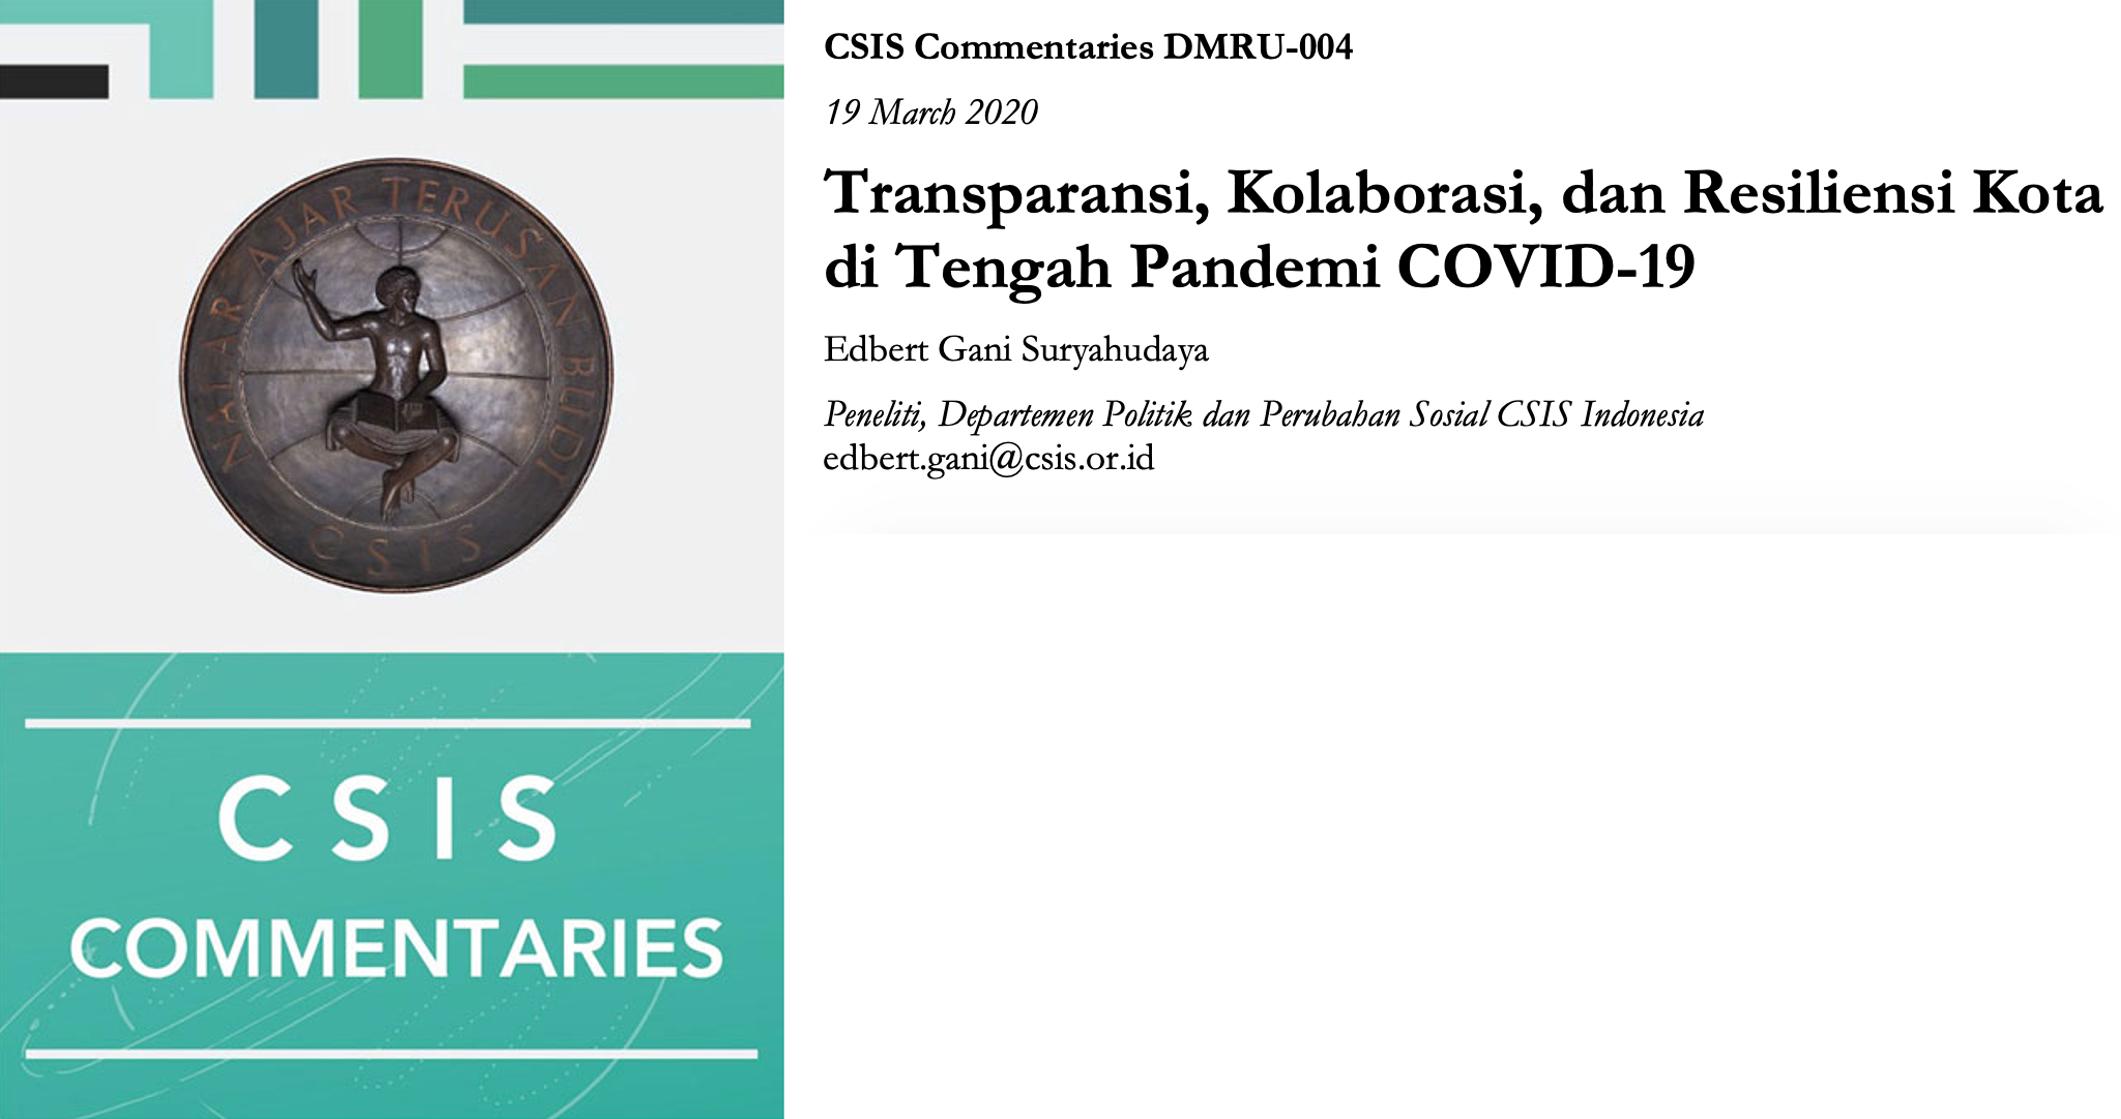 Mengukur Dampak COVID-19 pada Pertumbuhan Ekonomi dan Perdagangan Indonesia 2020